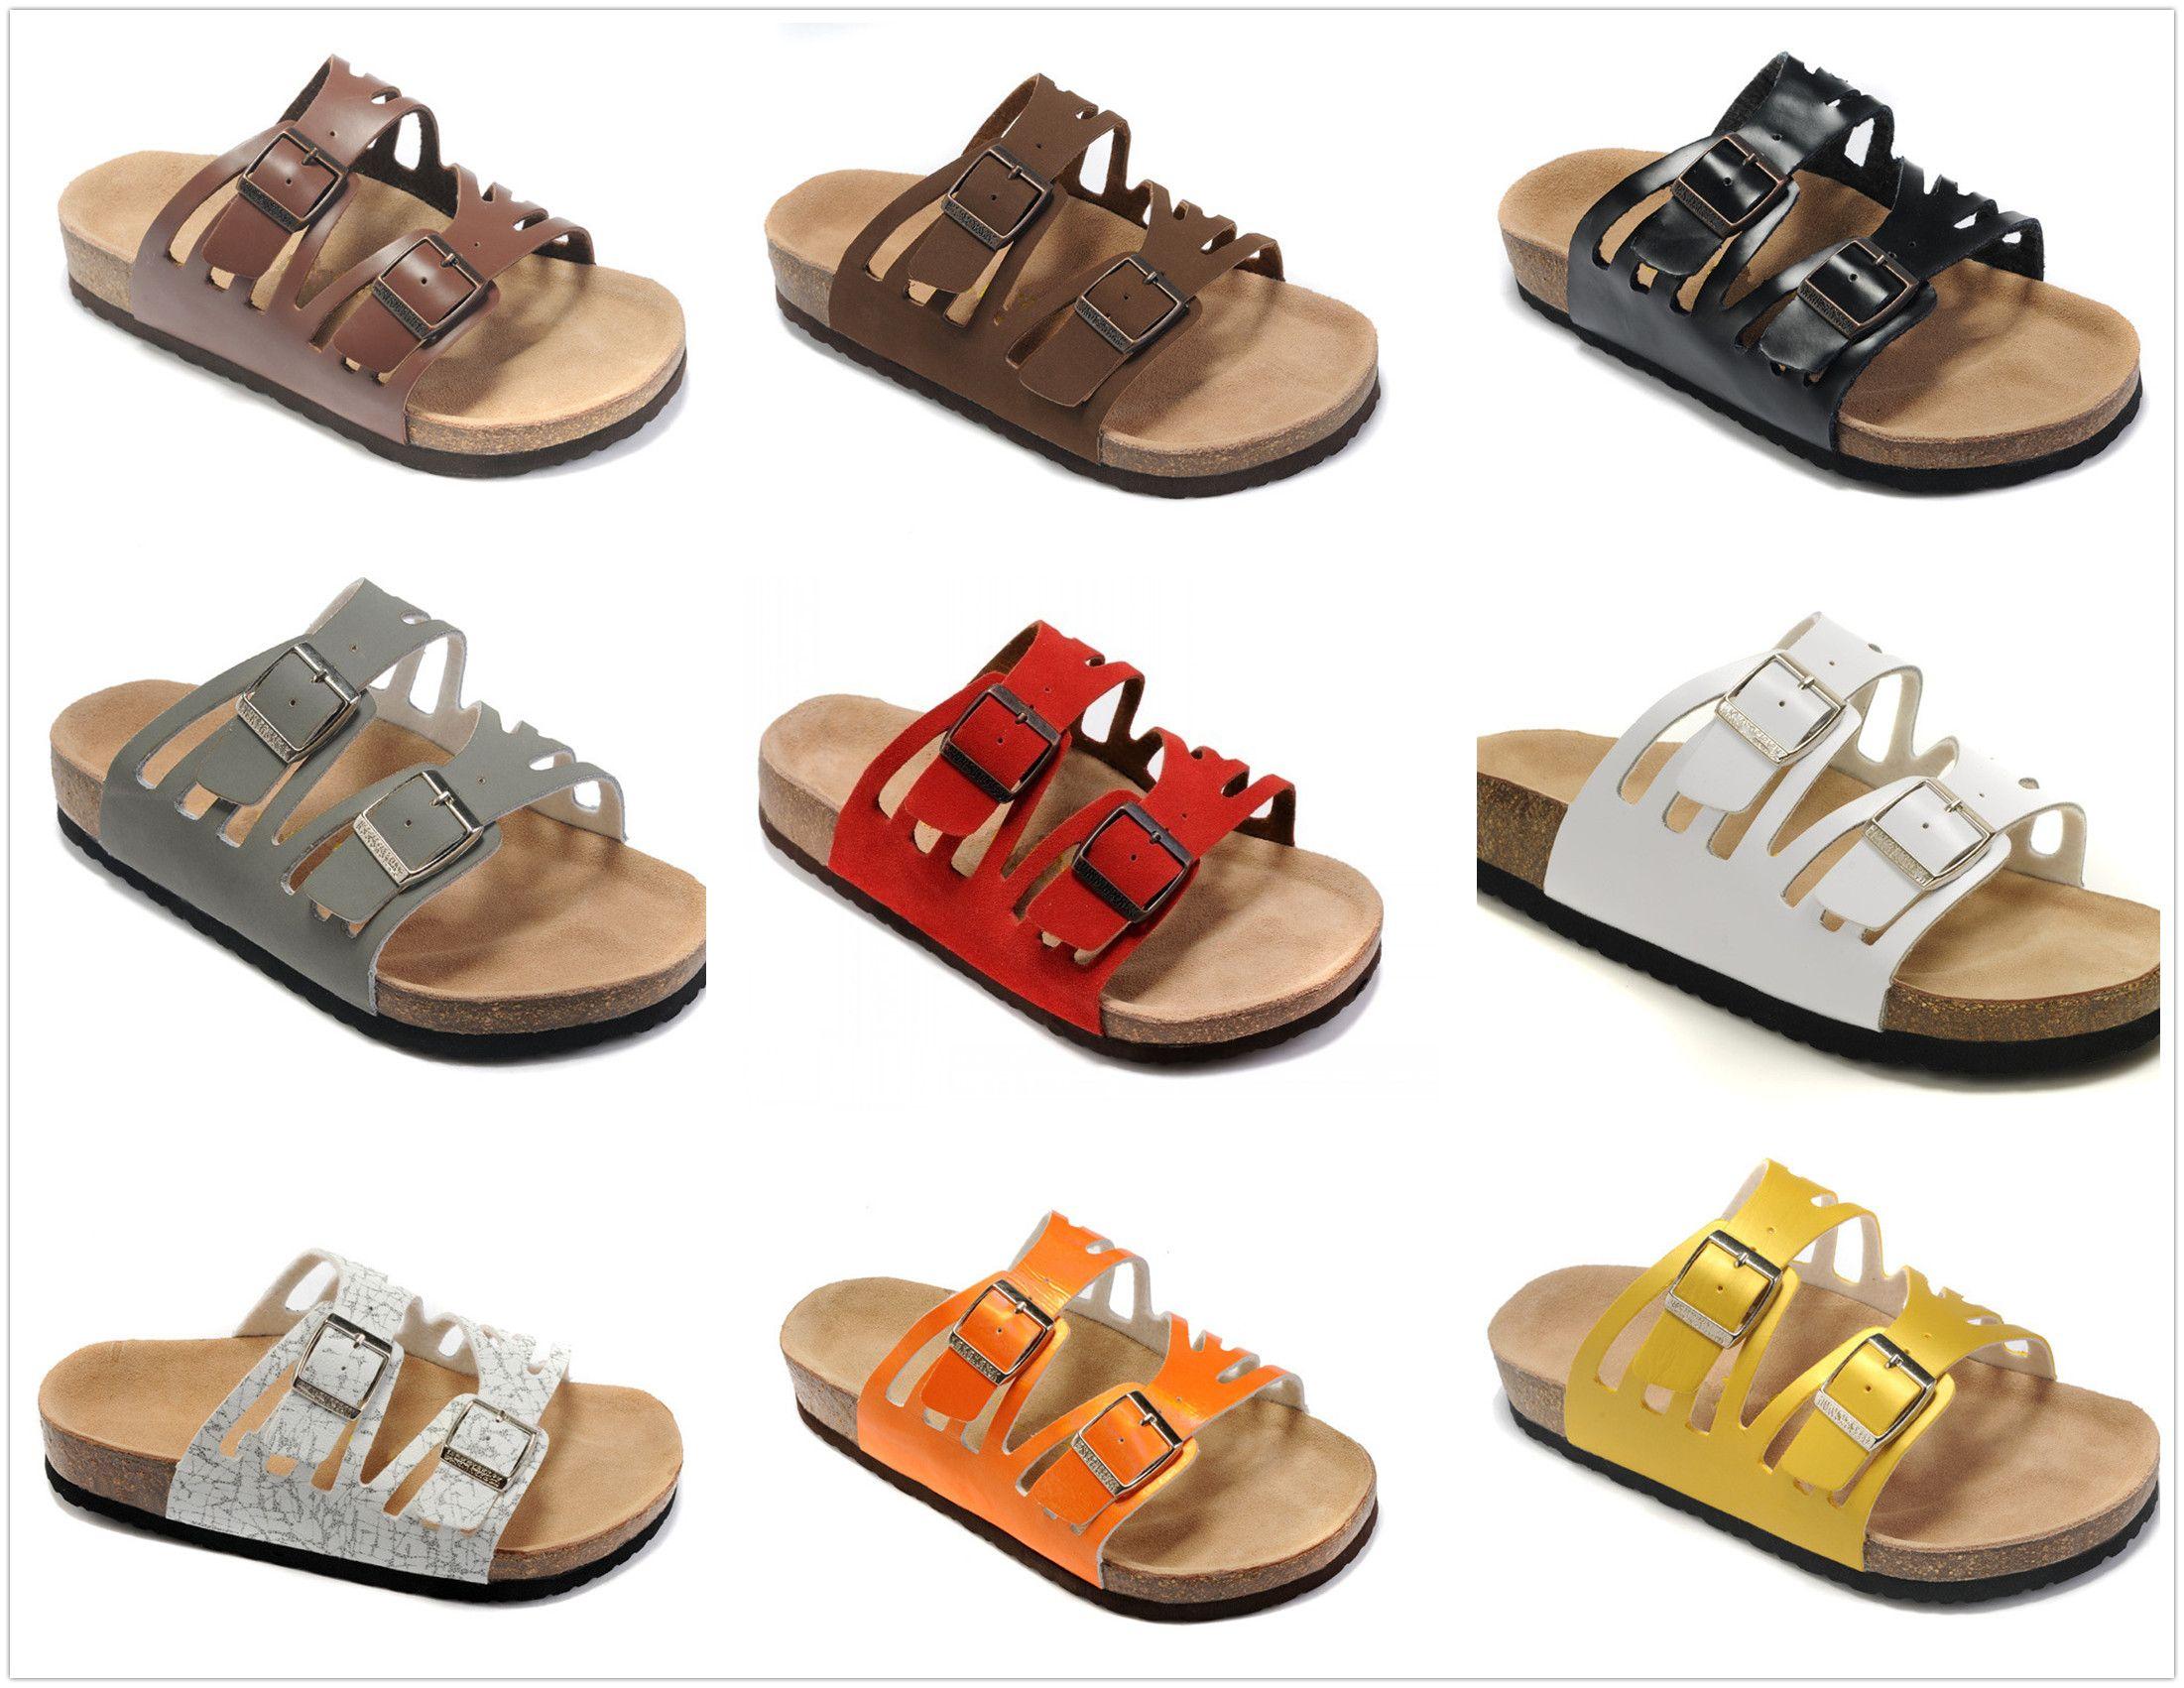 on sale 870a8 597c9 Neue Bunte Berühmte Marke Arizona Männer frauen Flache Ferse Flip Flops  Sandalen Sommer Strand Lässige Belüftung Komfortable Qualität Echte